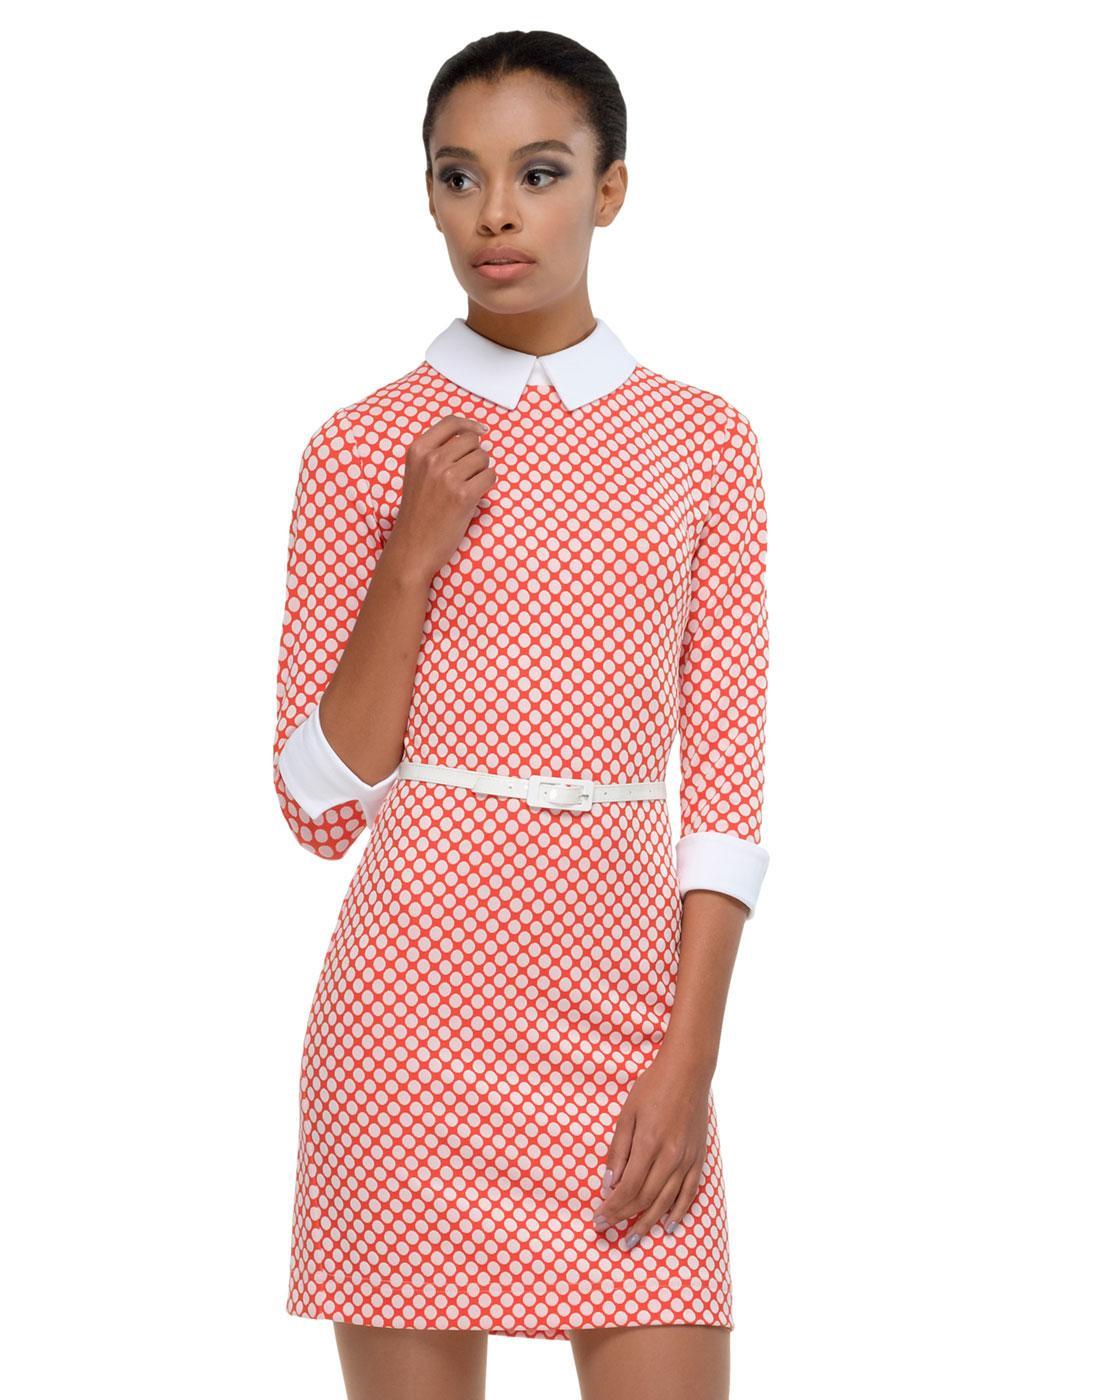 MARMALADE Retro 60s Polka Dot Dress with Sleeves